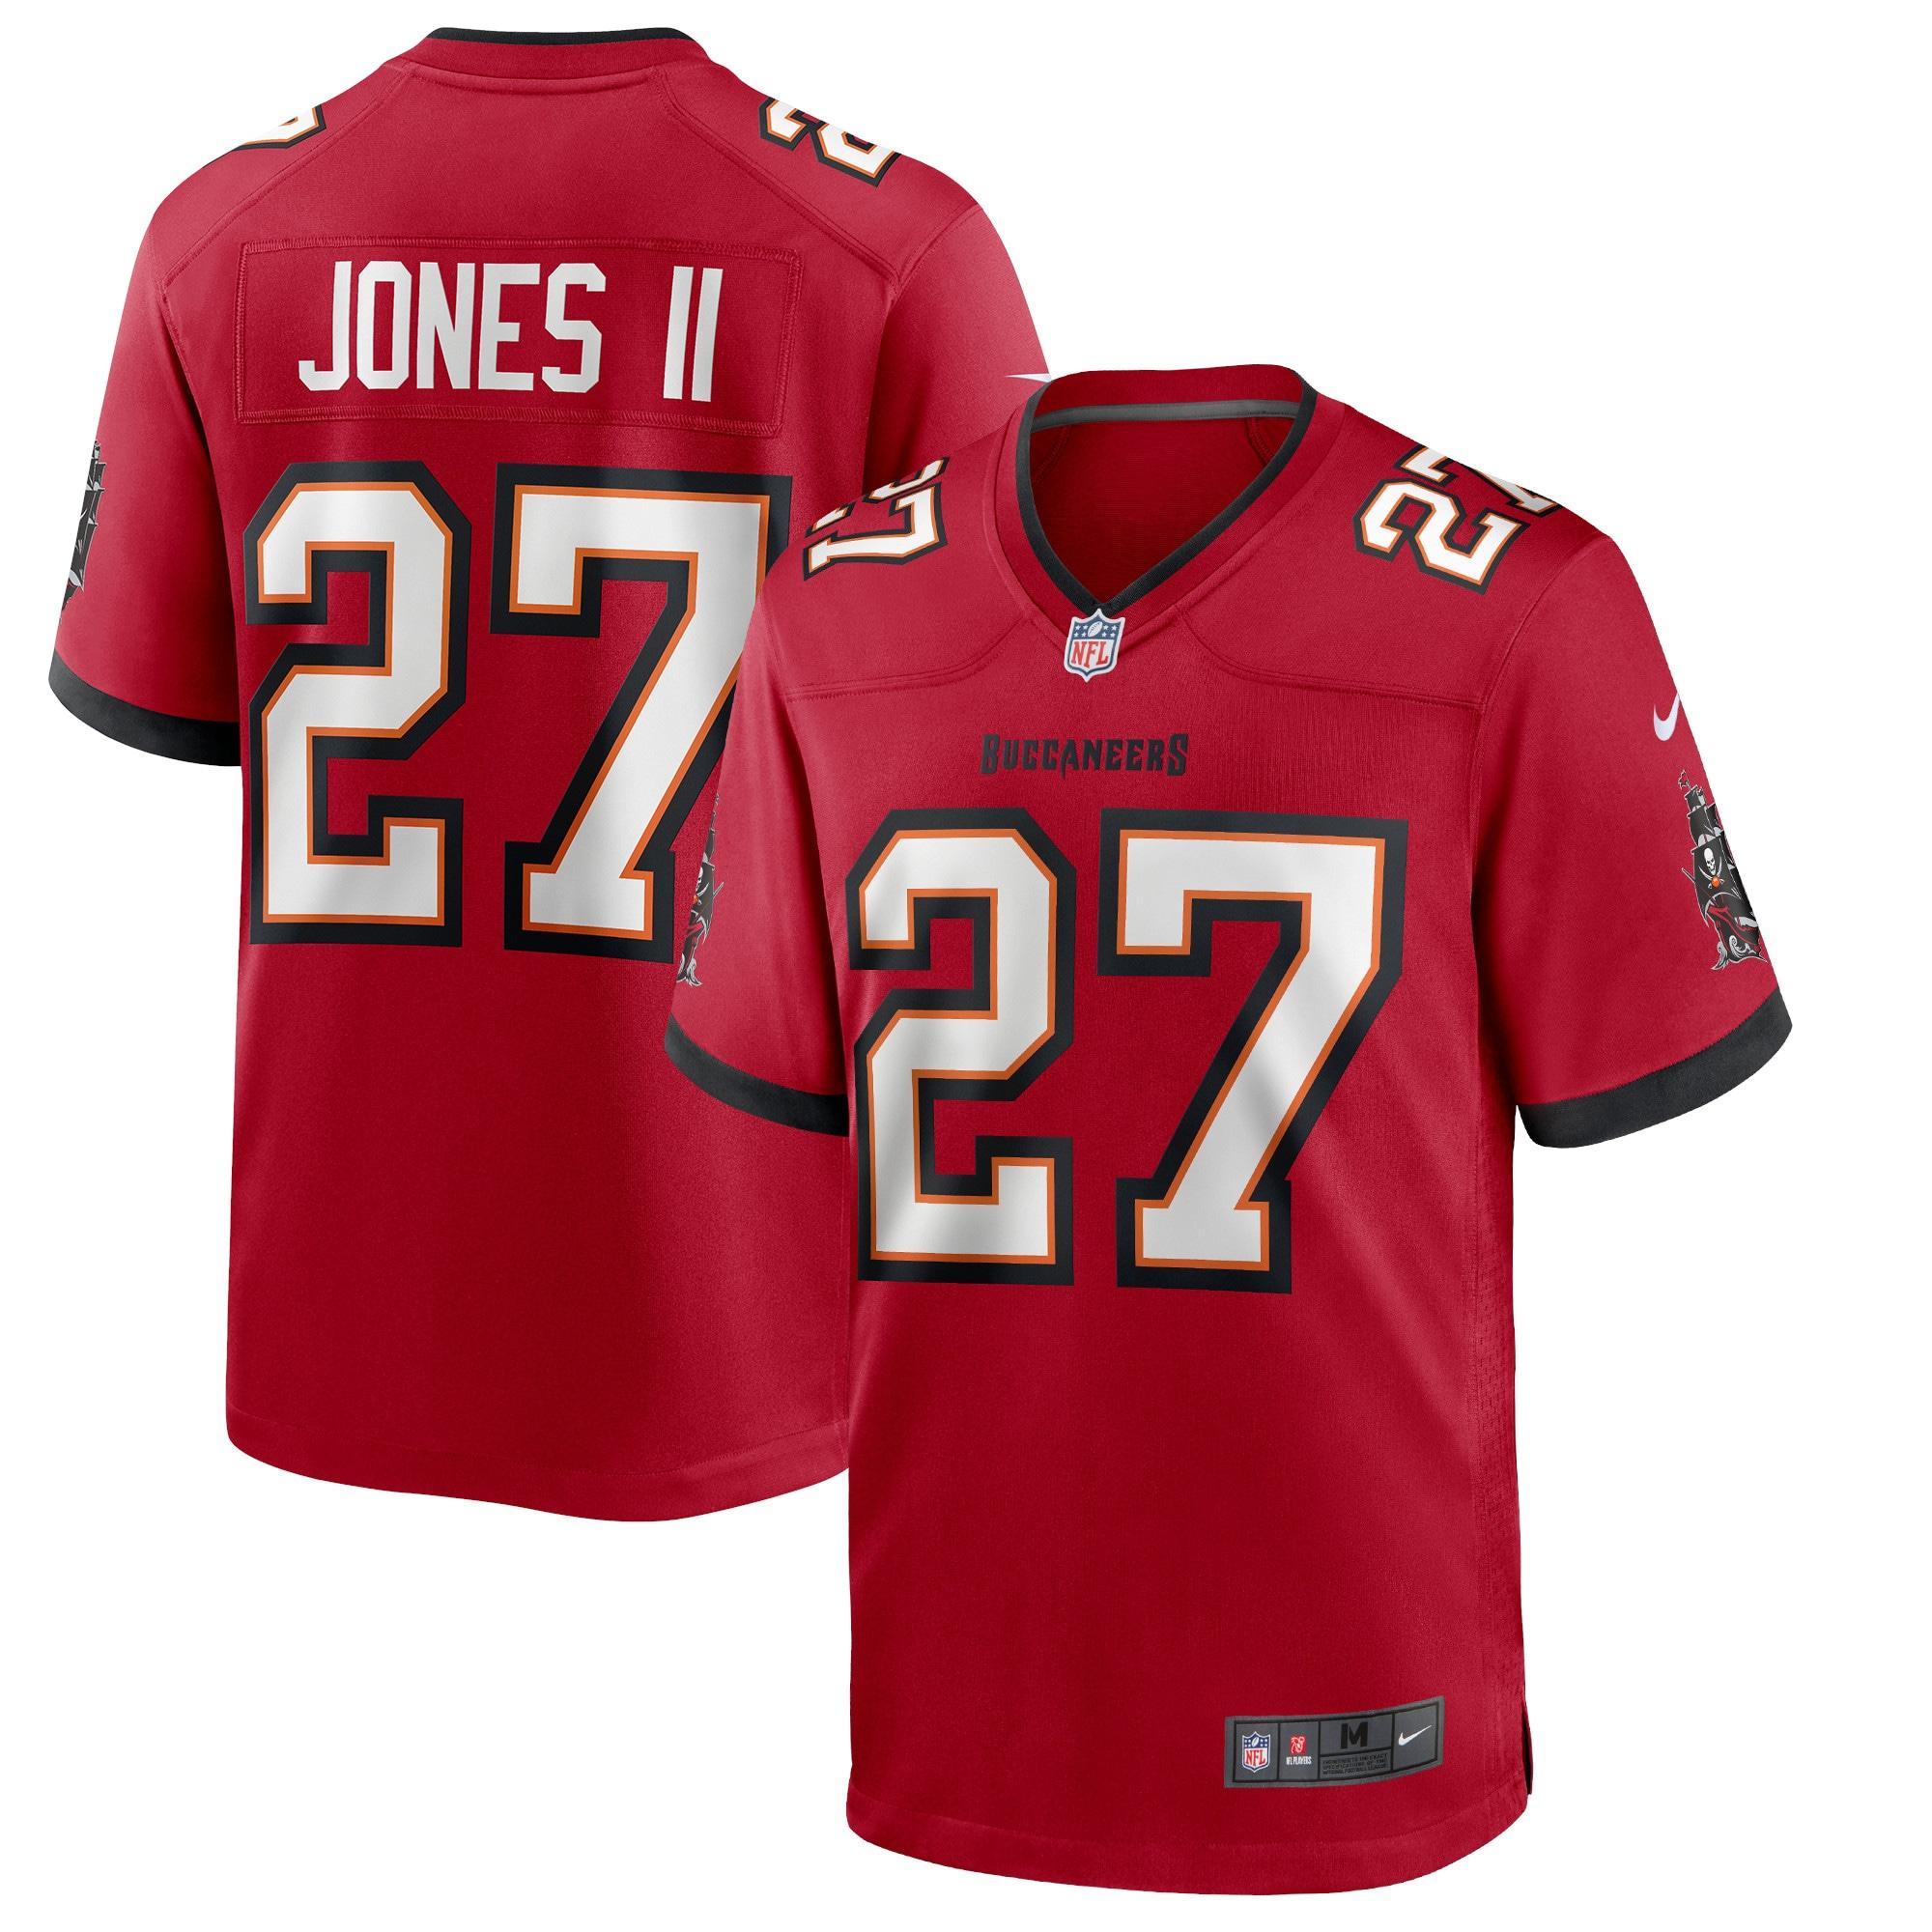 Ronald Jones II Tampa Bay Buccaneers Nike Game Jersey - Red